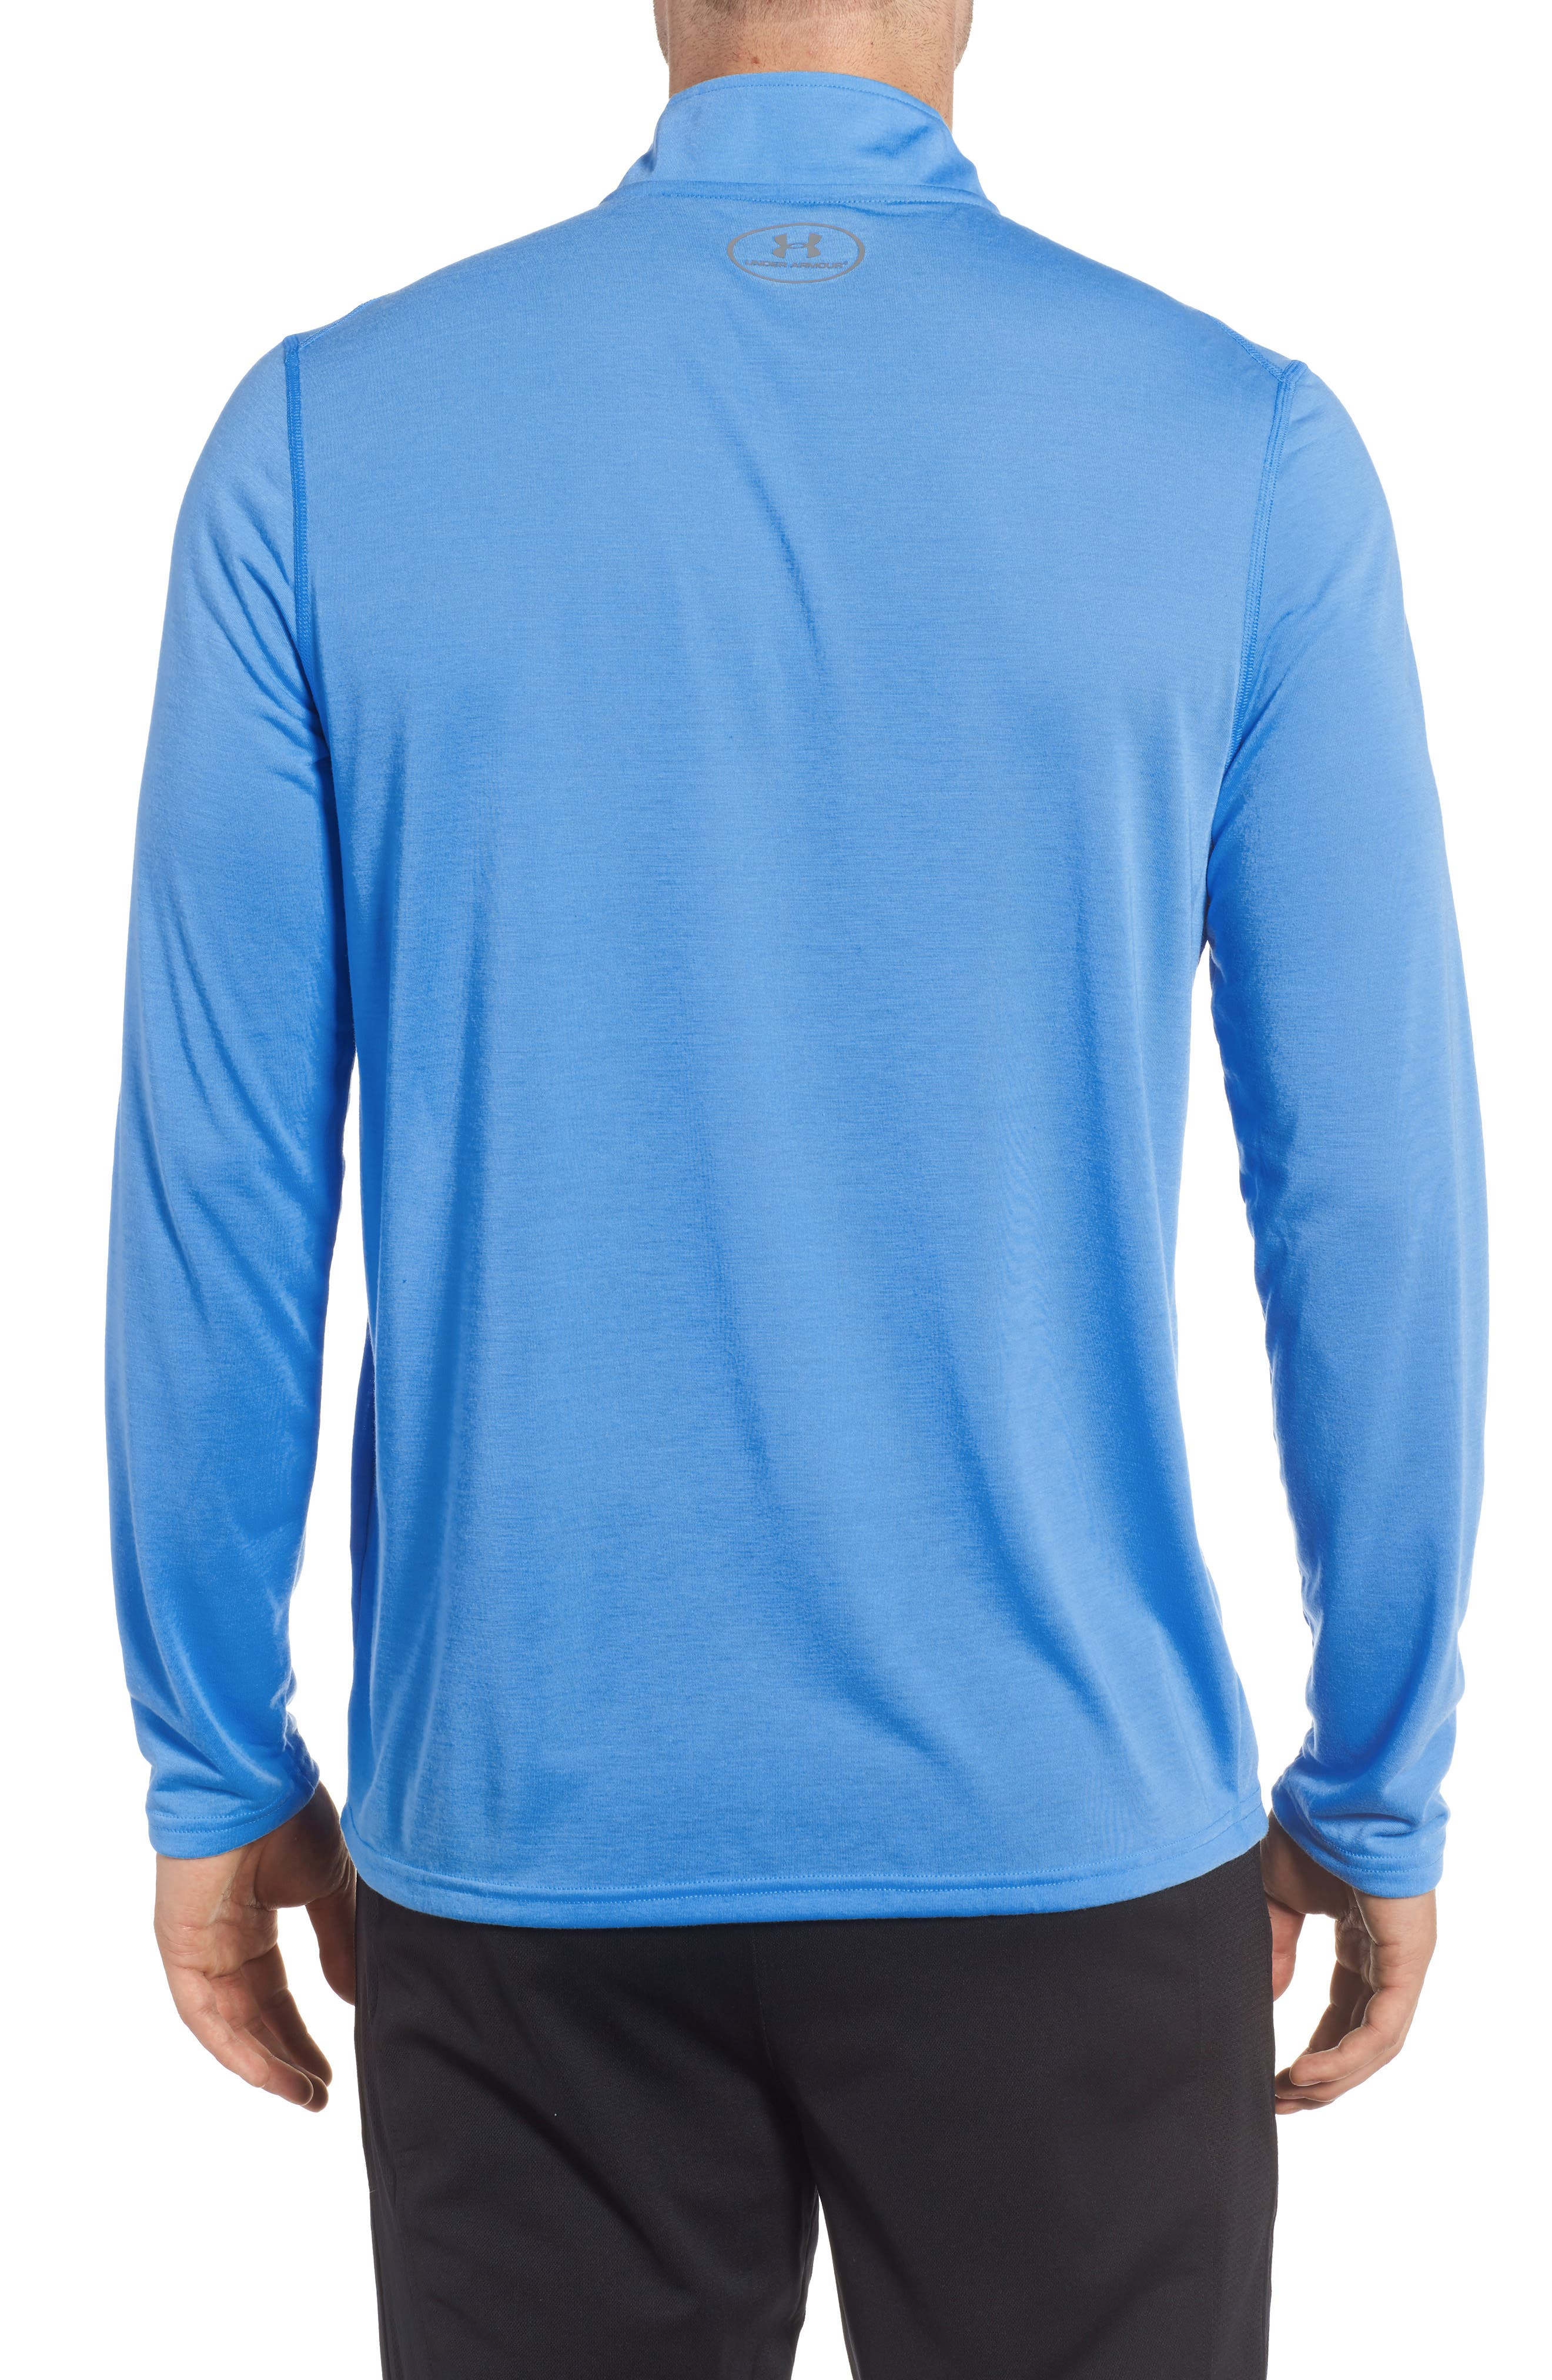 Threadborne Quarter-Zip Performance Shirt,                             Alternate thumbnail 2, color,                             Mako Blue / Graphite